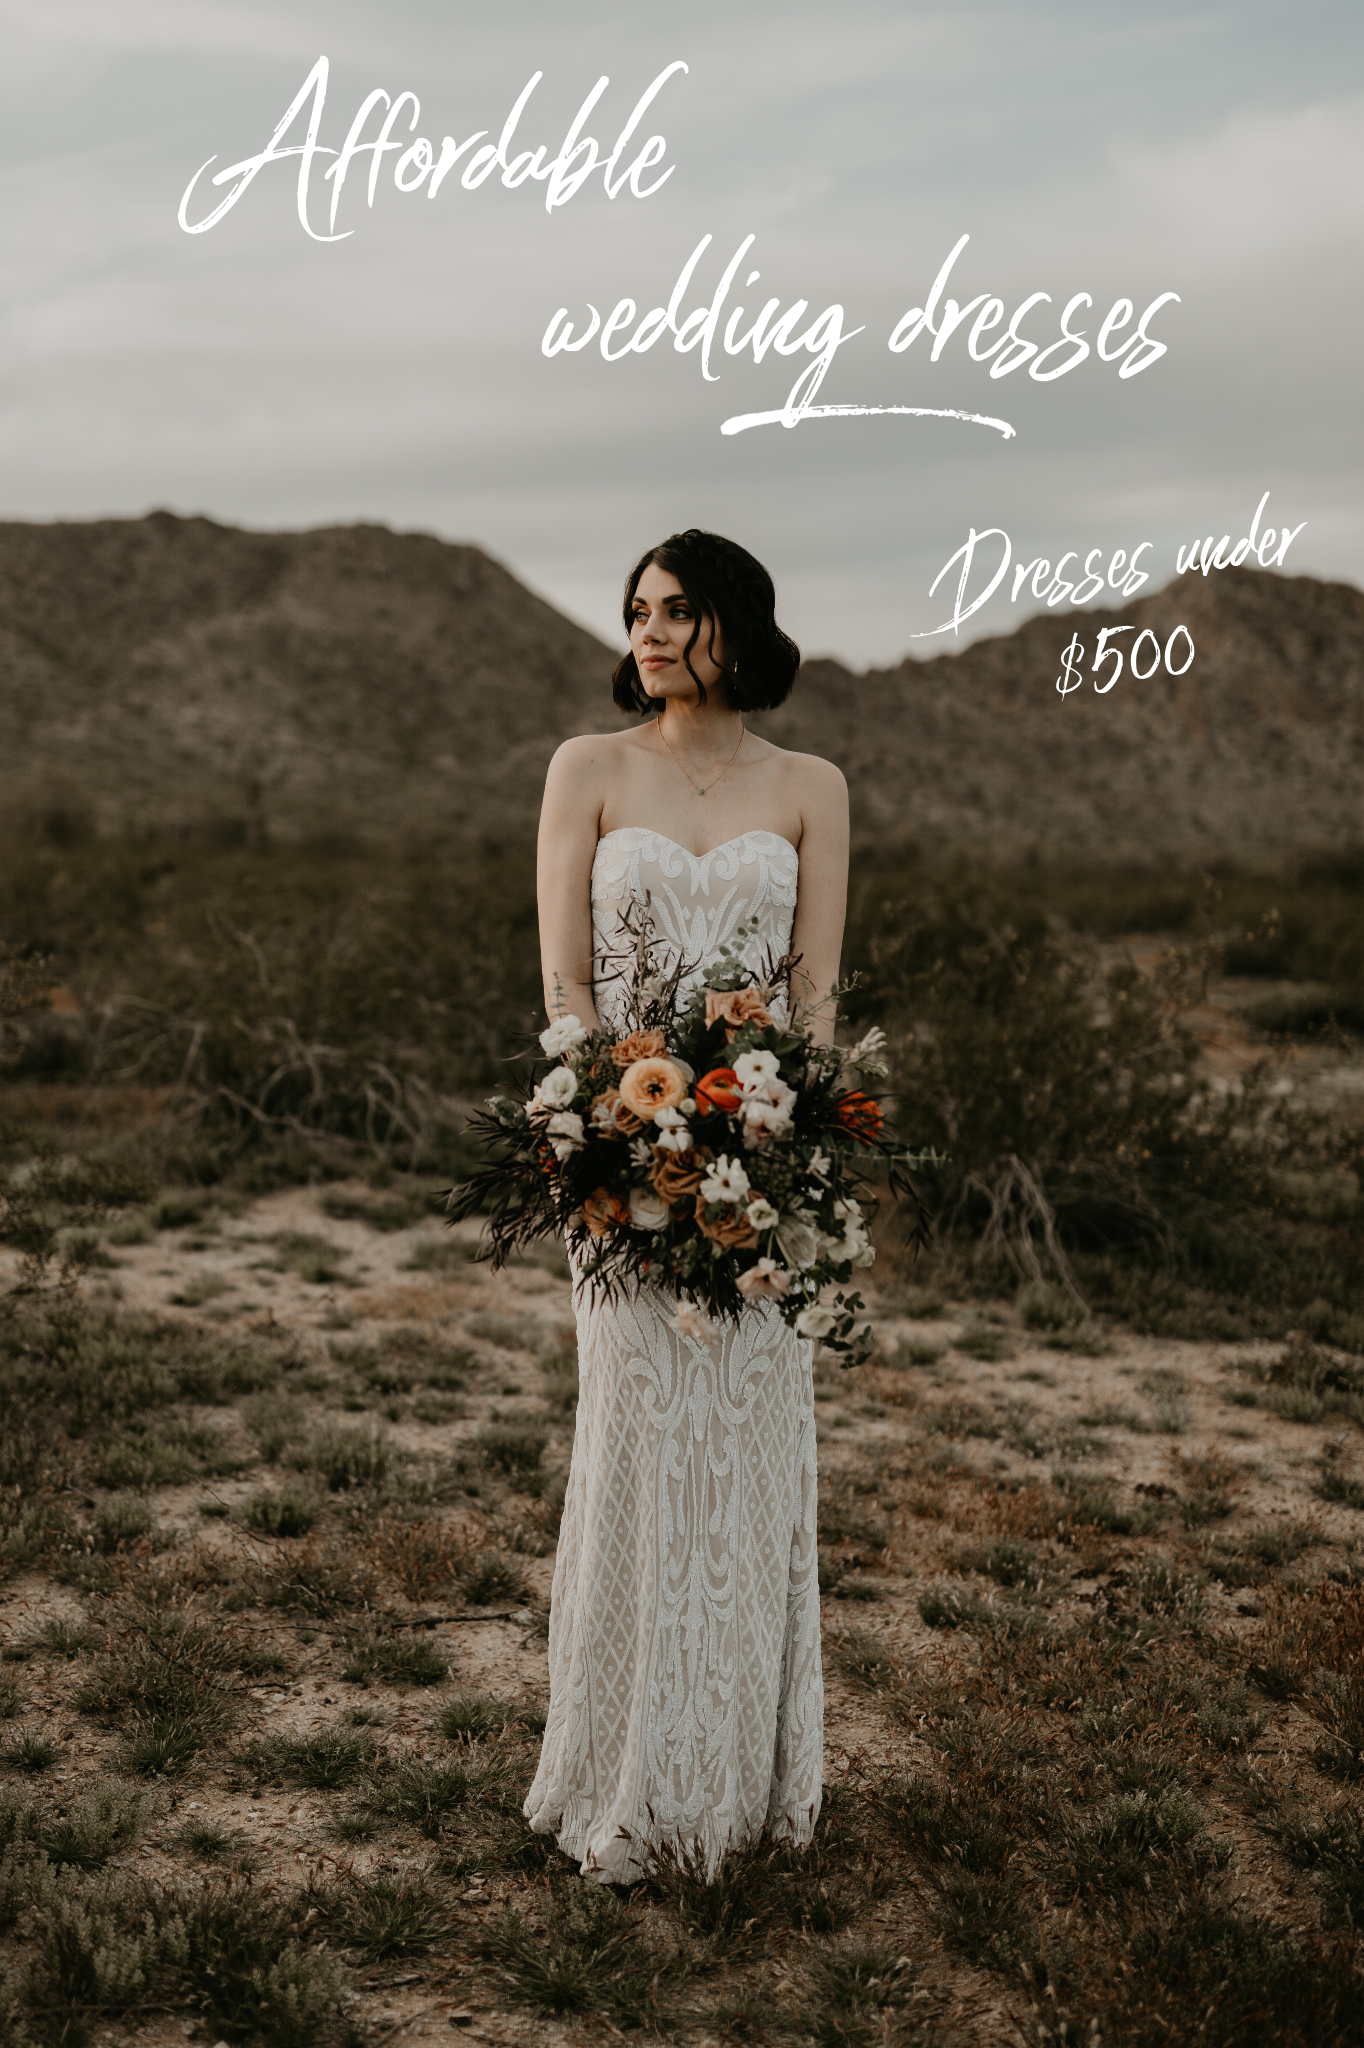 Affordable wedding dress, low budget wedding, cheap wedding dress, affordable boho wedding dress